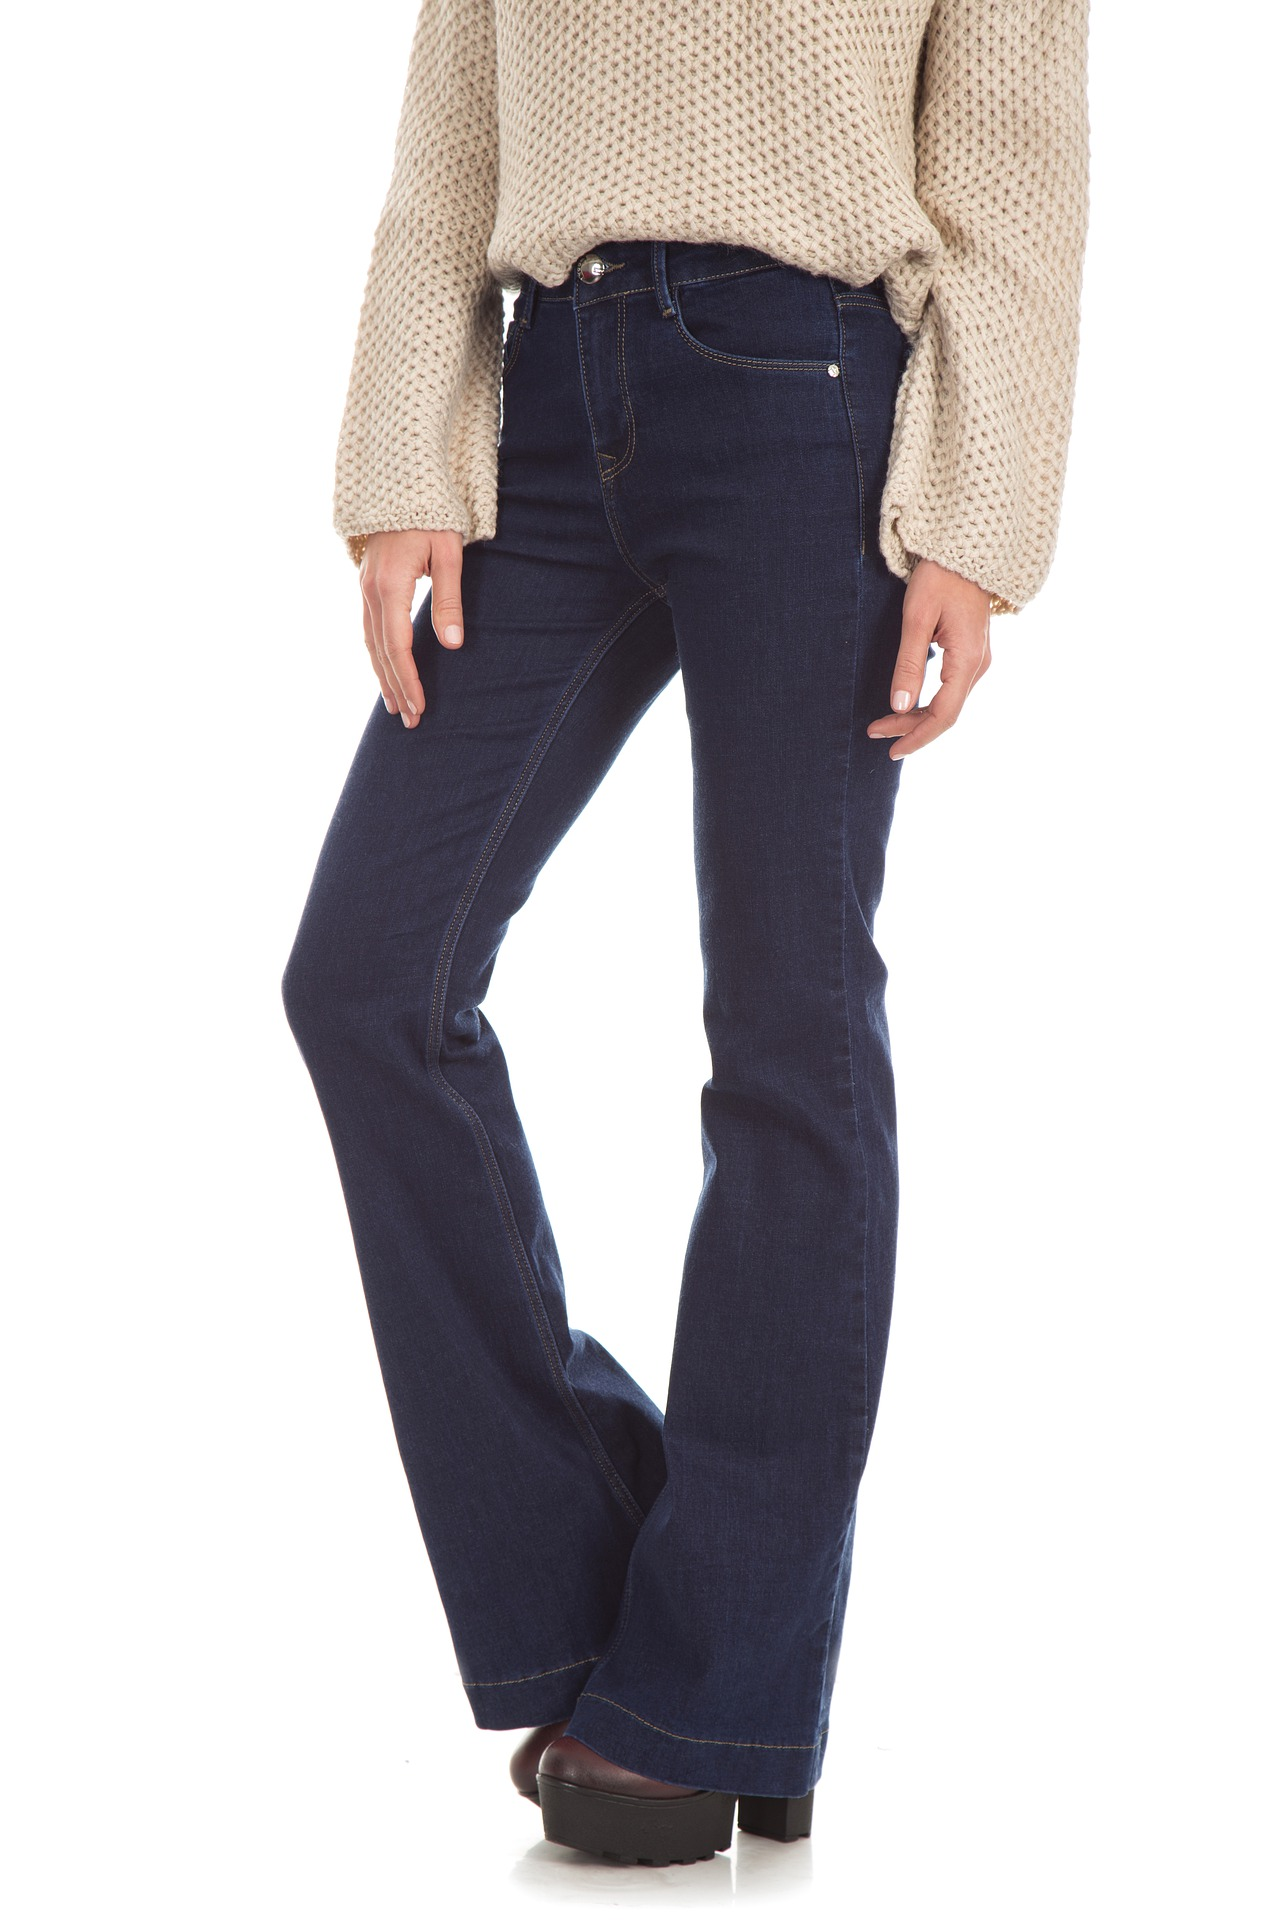 outfit jeans e tacchi come indossare